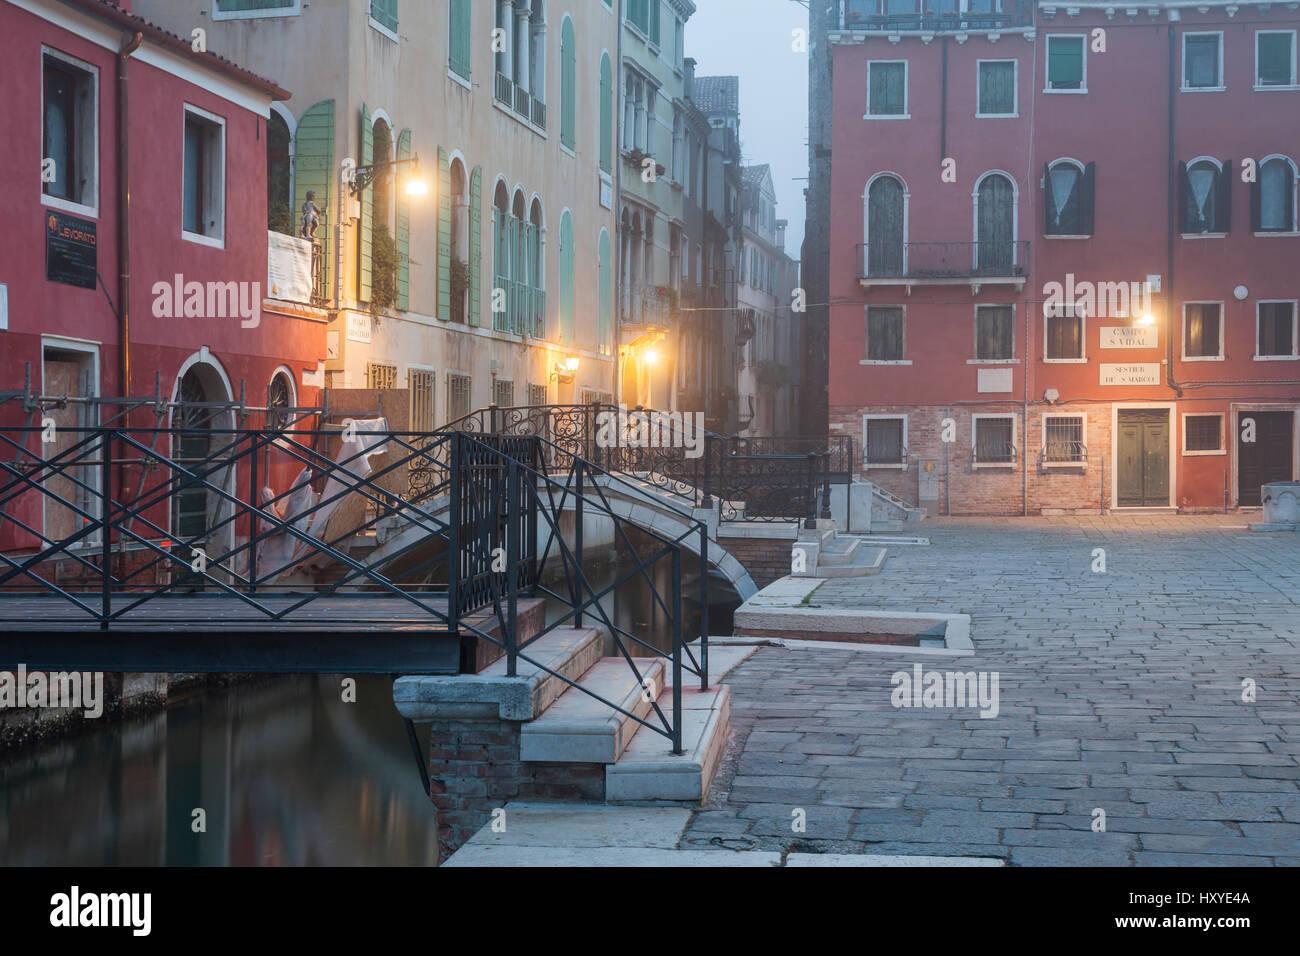 Nebeliger Morgen auf einen Kanal im Sestiere San Marco, Venedig, Italien. Stockbild